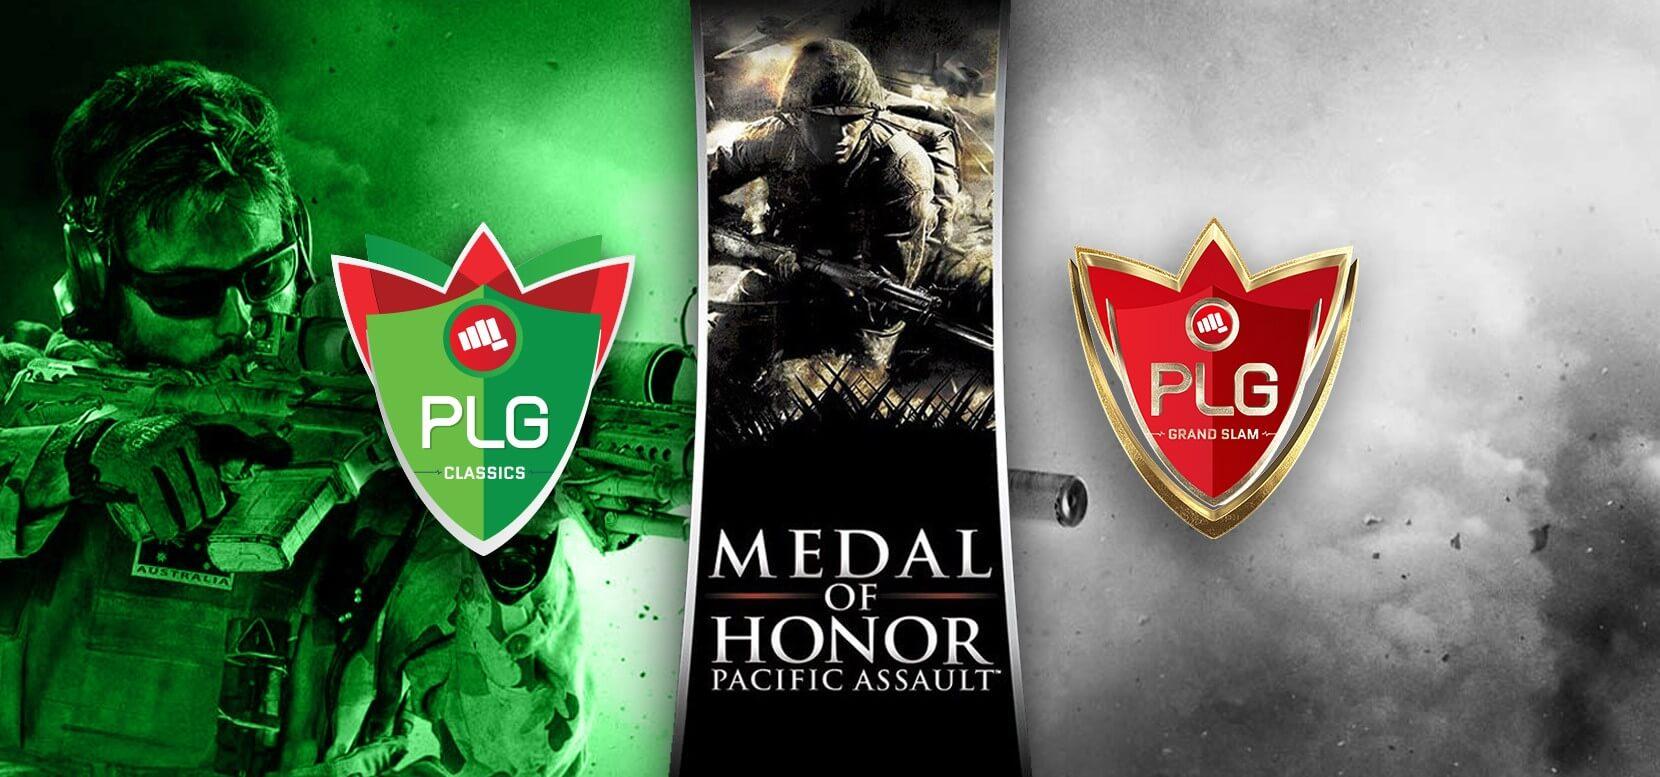 PLG Grand Slam Medal of Honor Pacific Assault